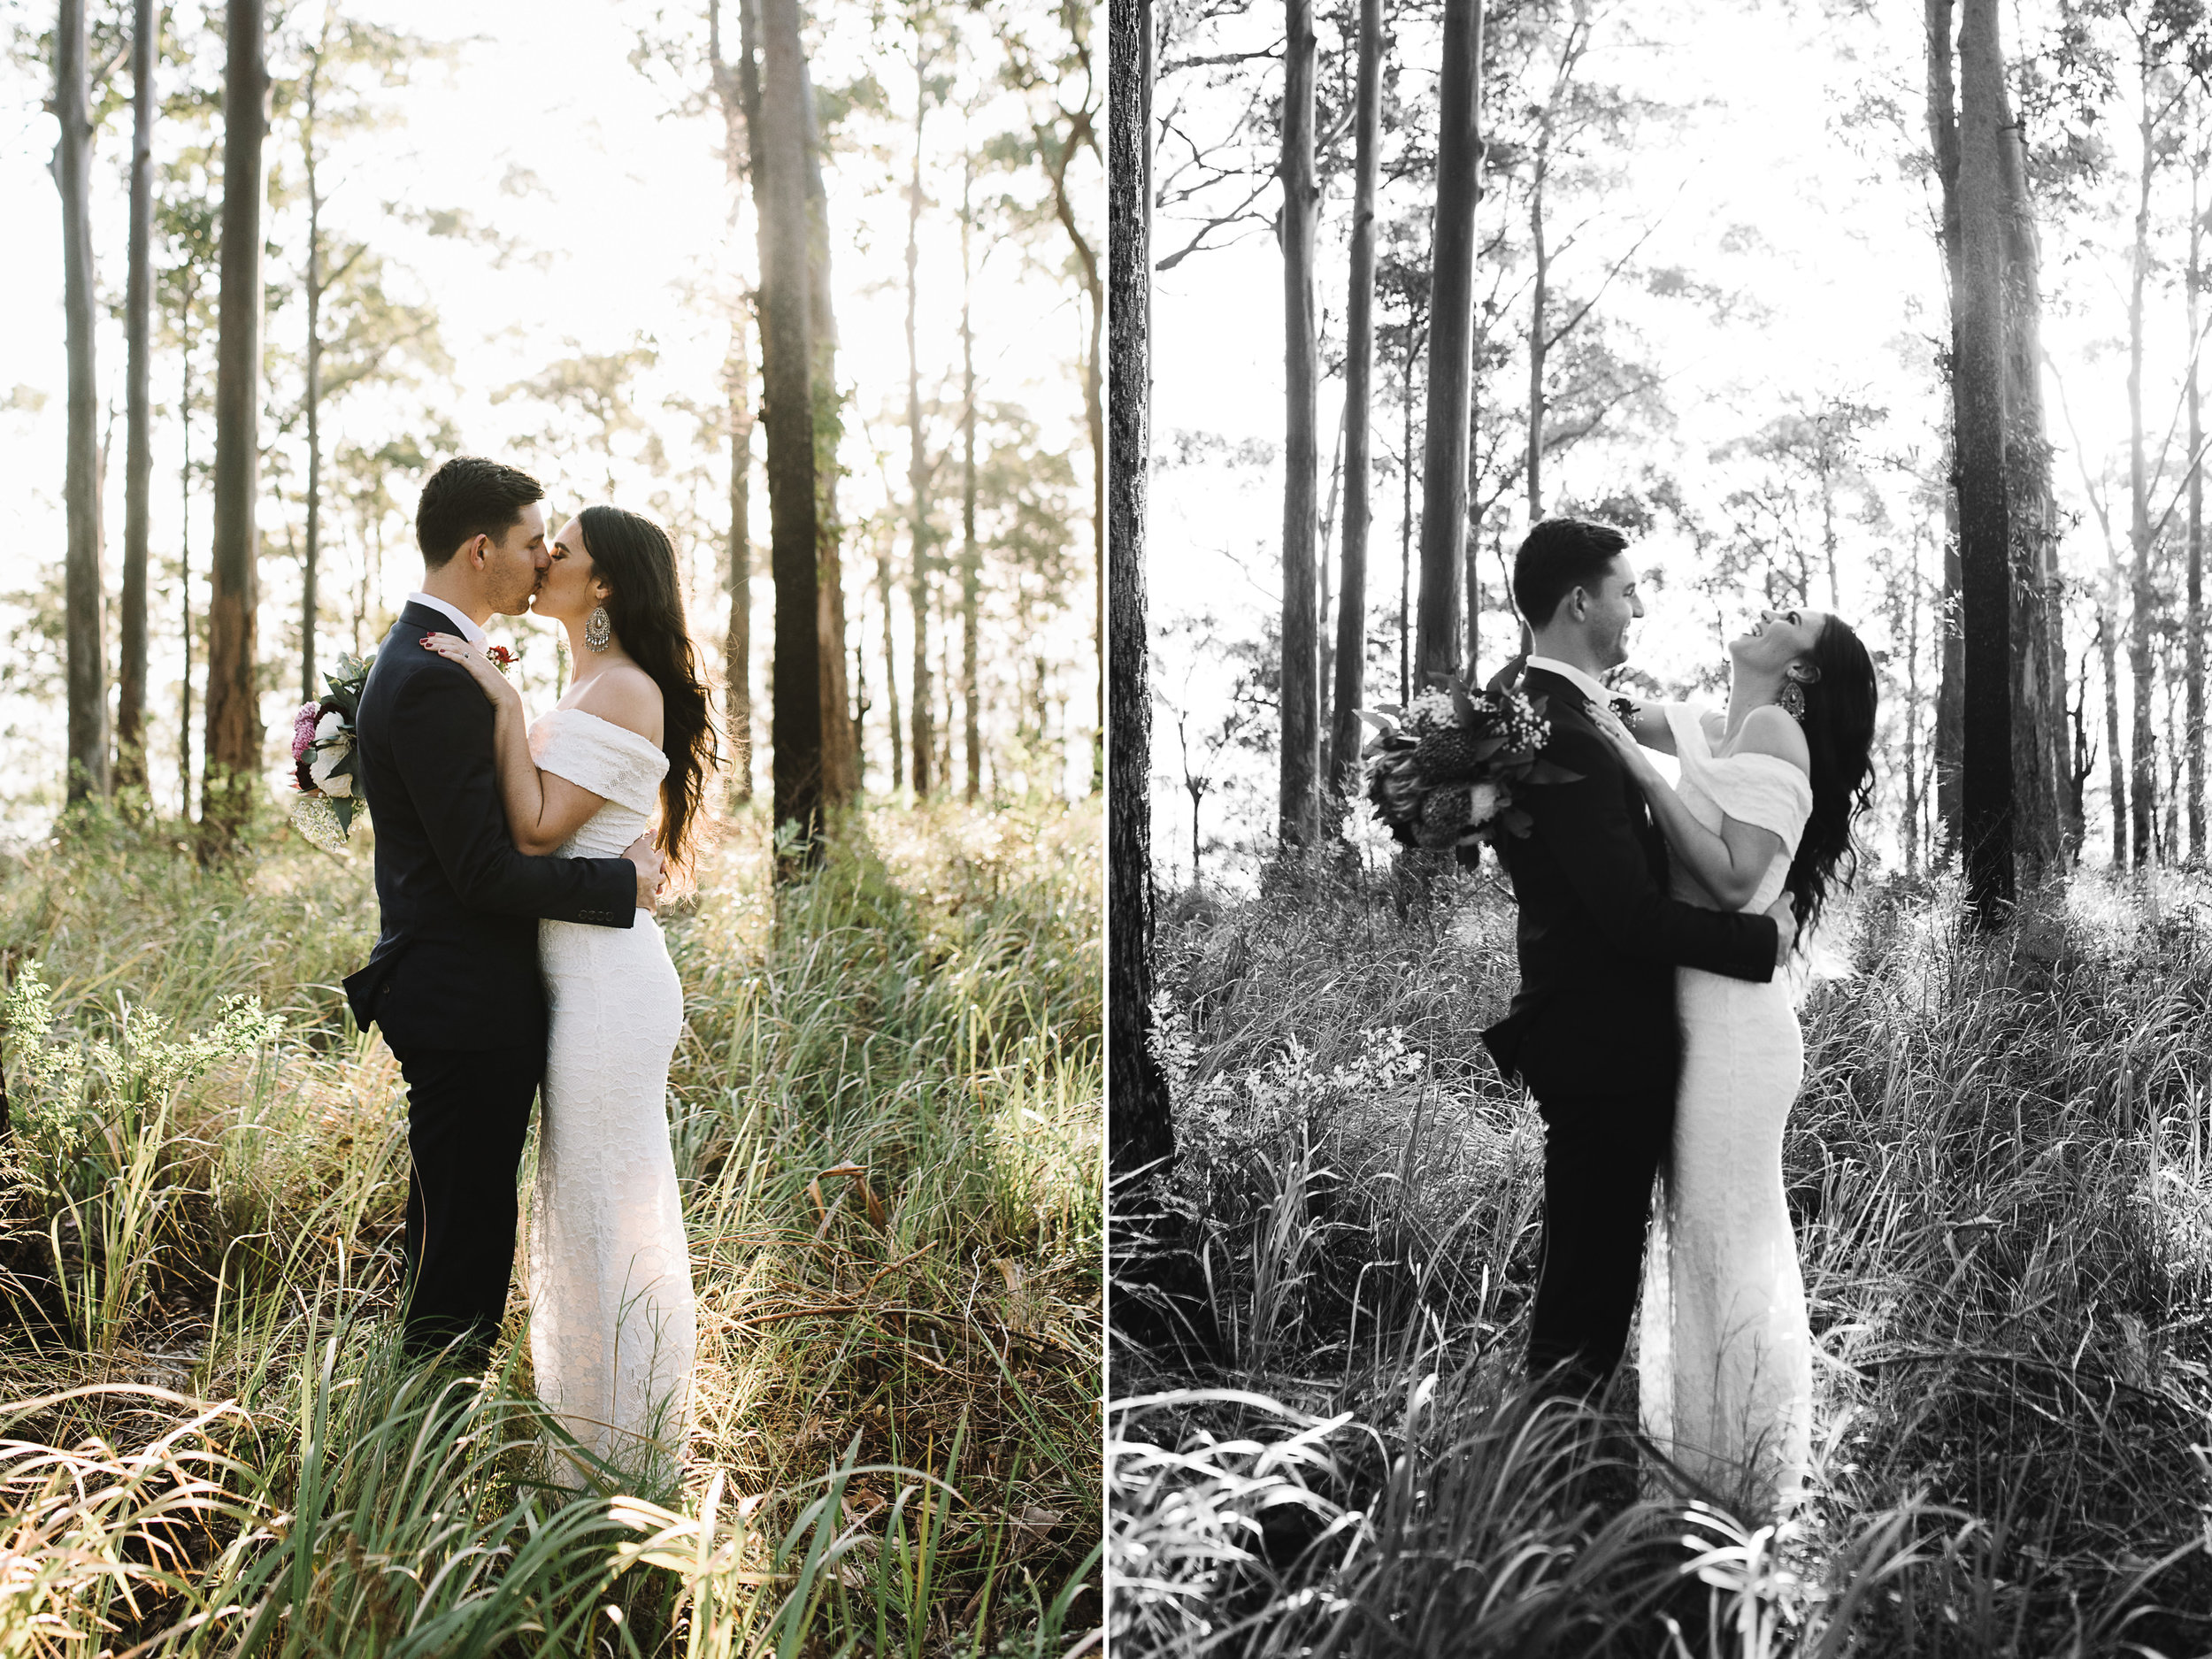 brisbane-gold-coast-sunshine-coast-wedding-photographer-mount-tamborine-wedding-26.jpg